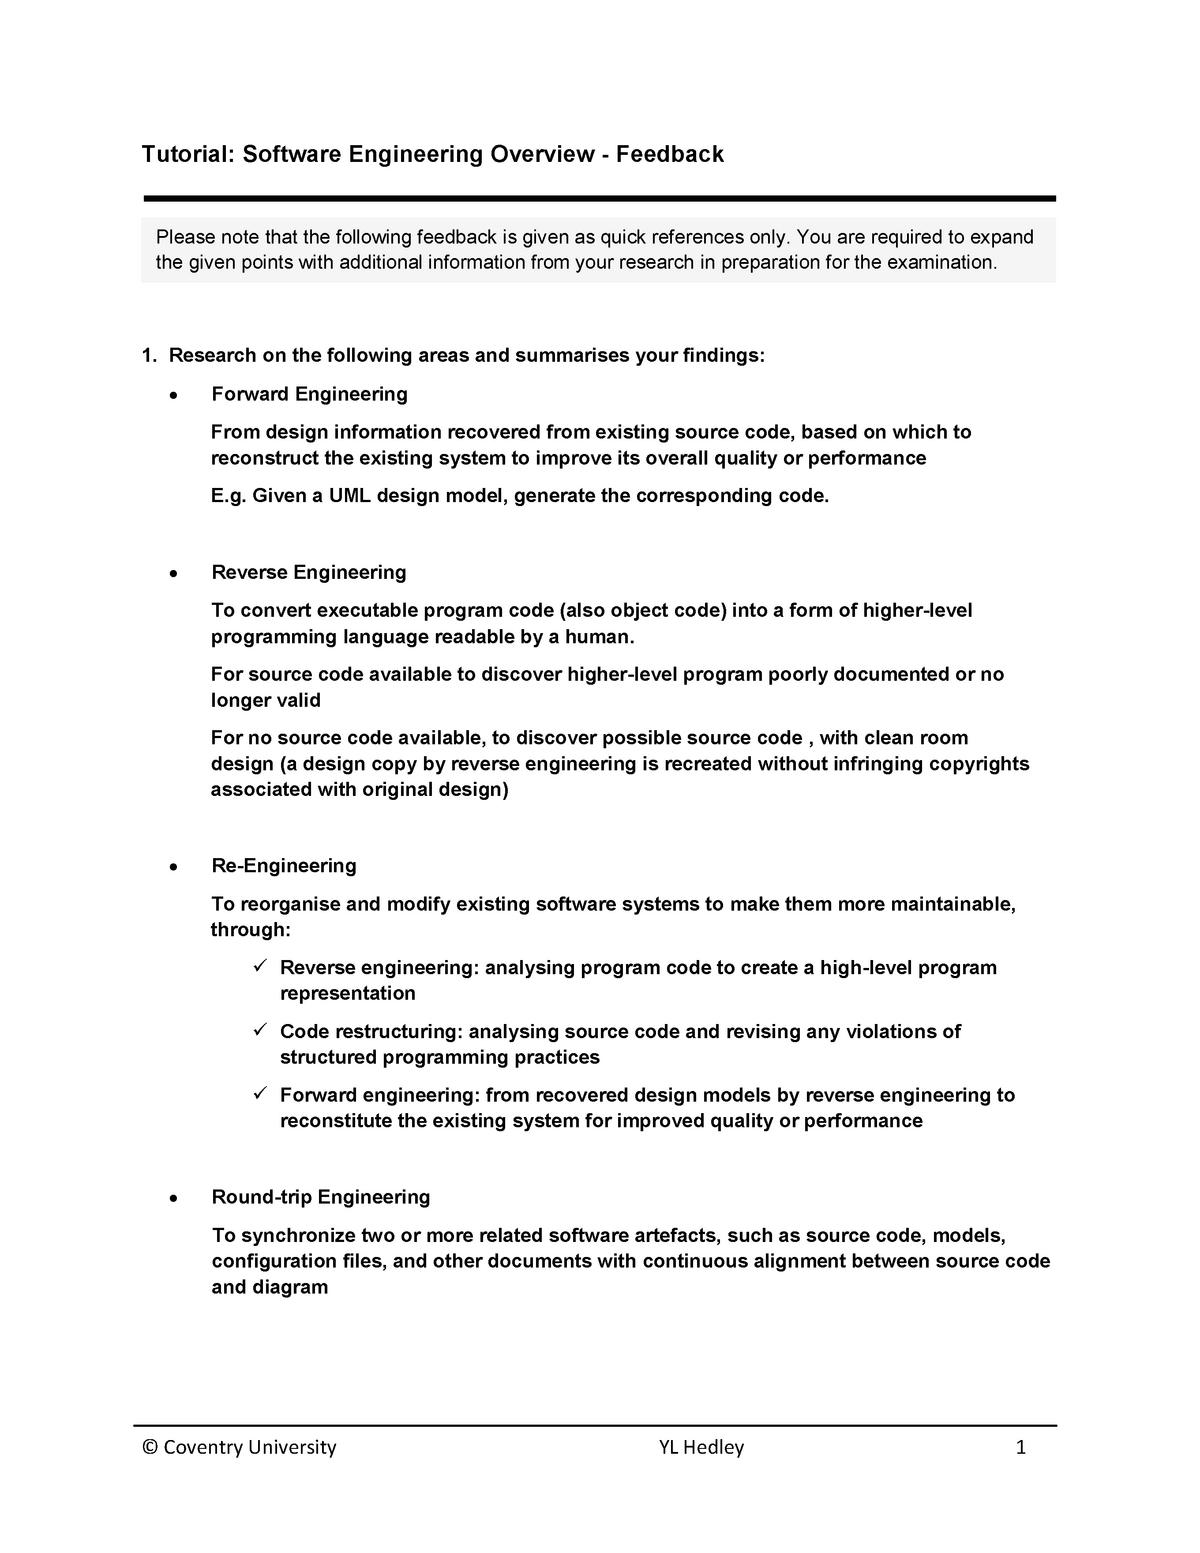 Tutorial Software Engineering Overview Feedback V1 Studocu